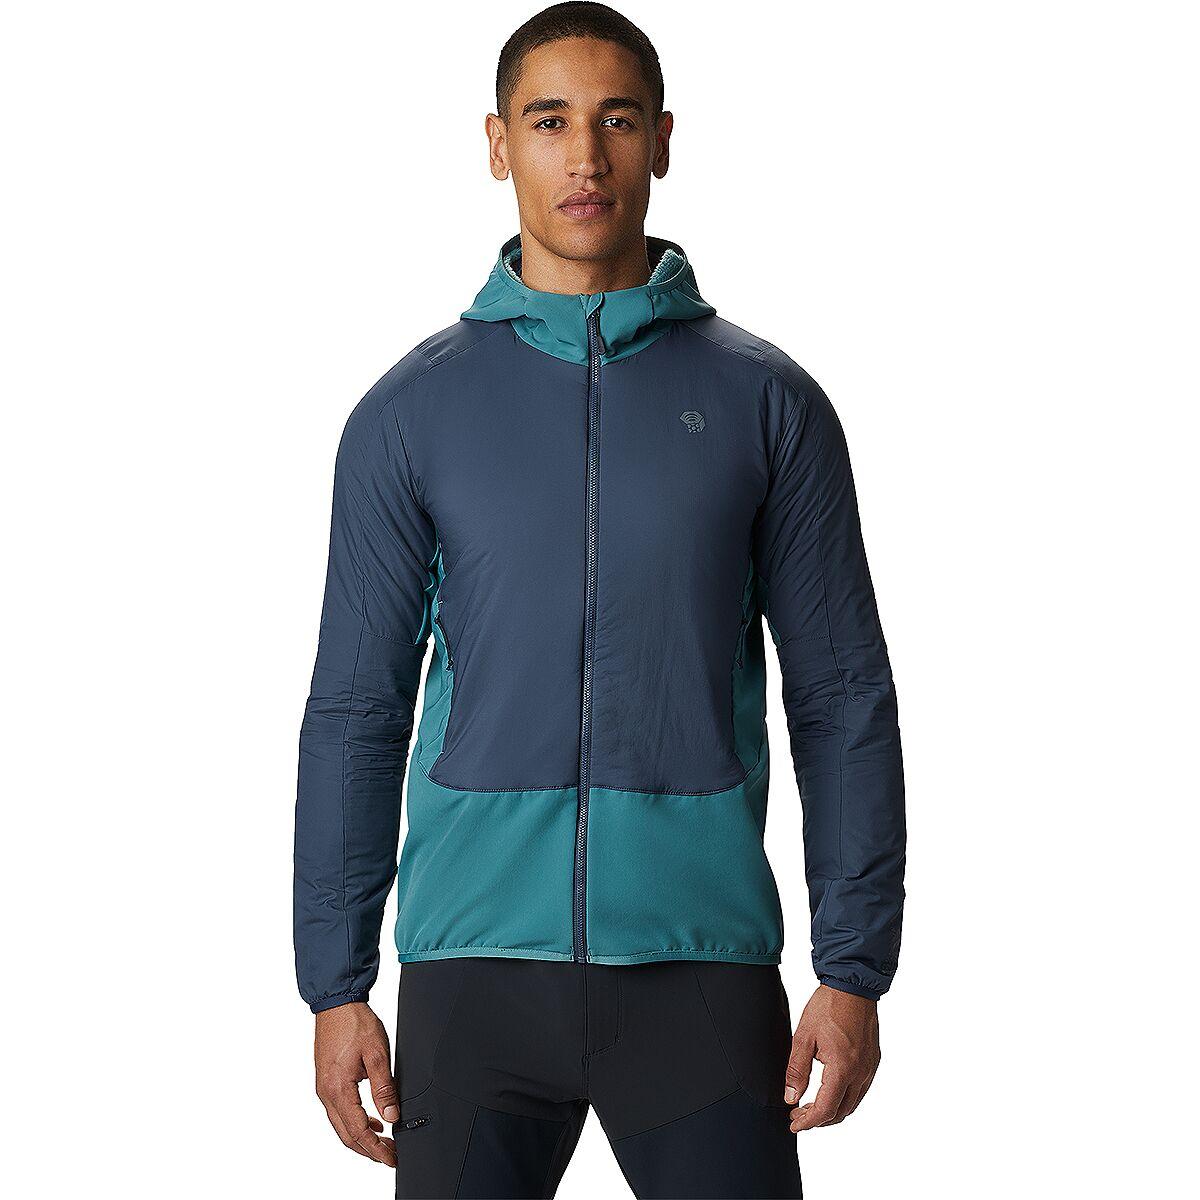 Kor Strata Climb Hooded Jacket - Men